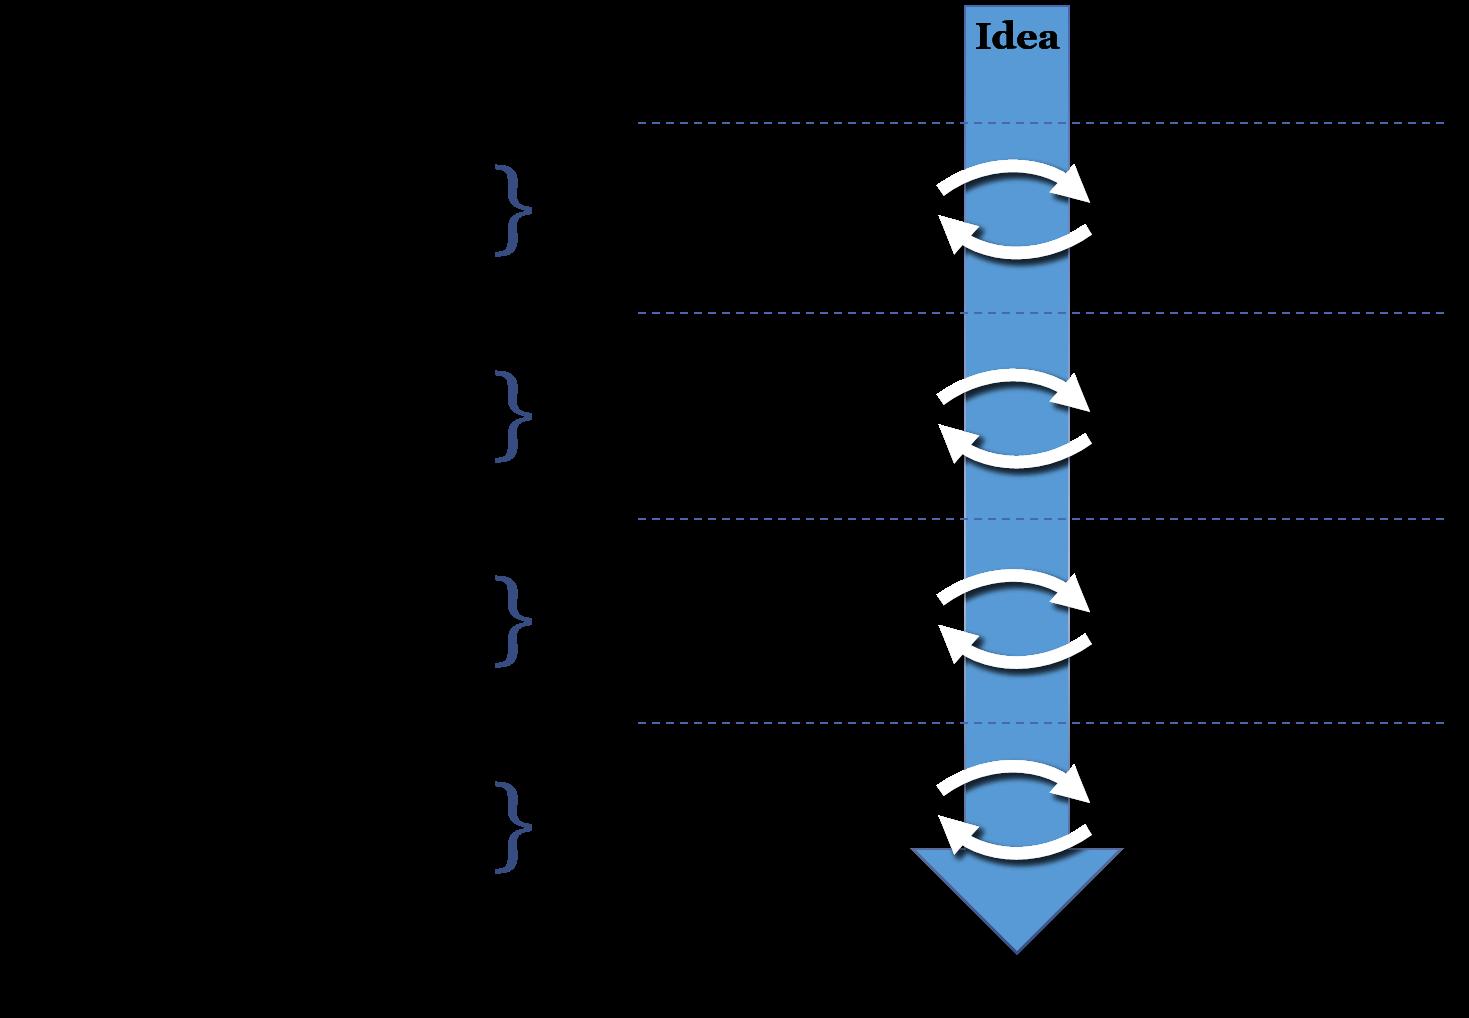 Adaptable's model